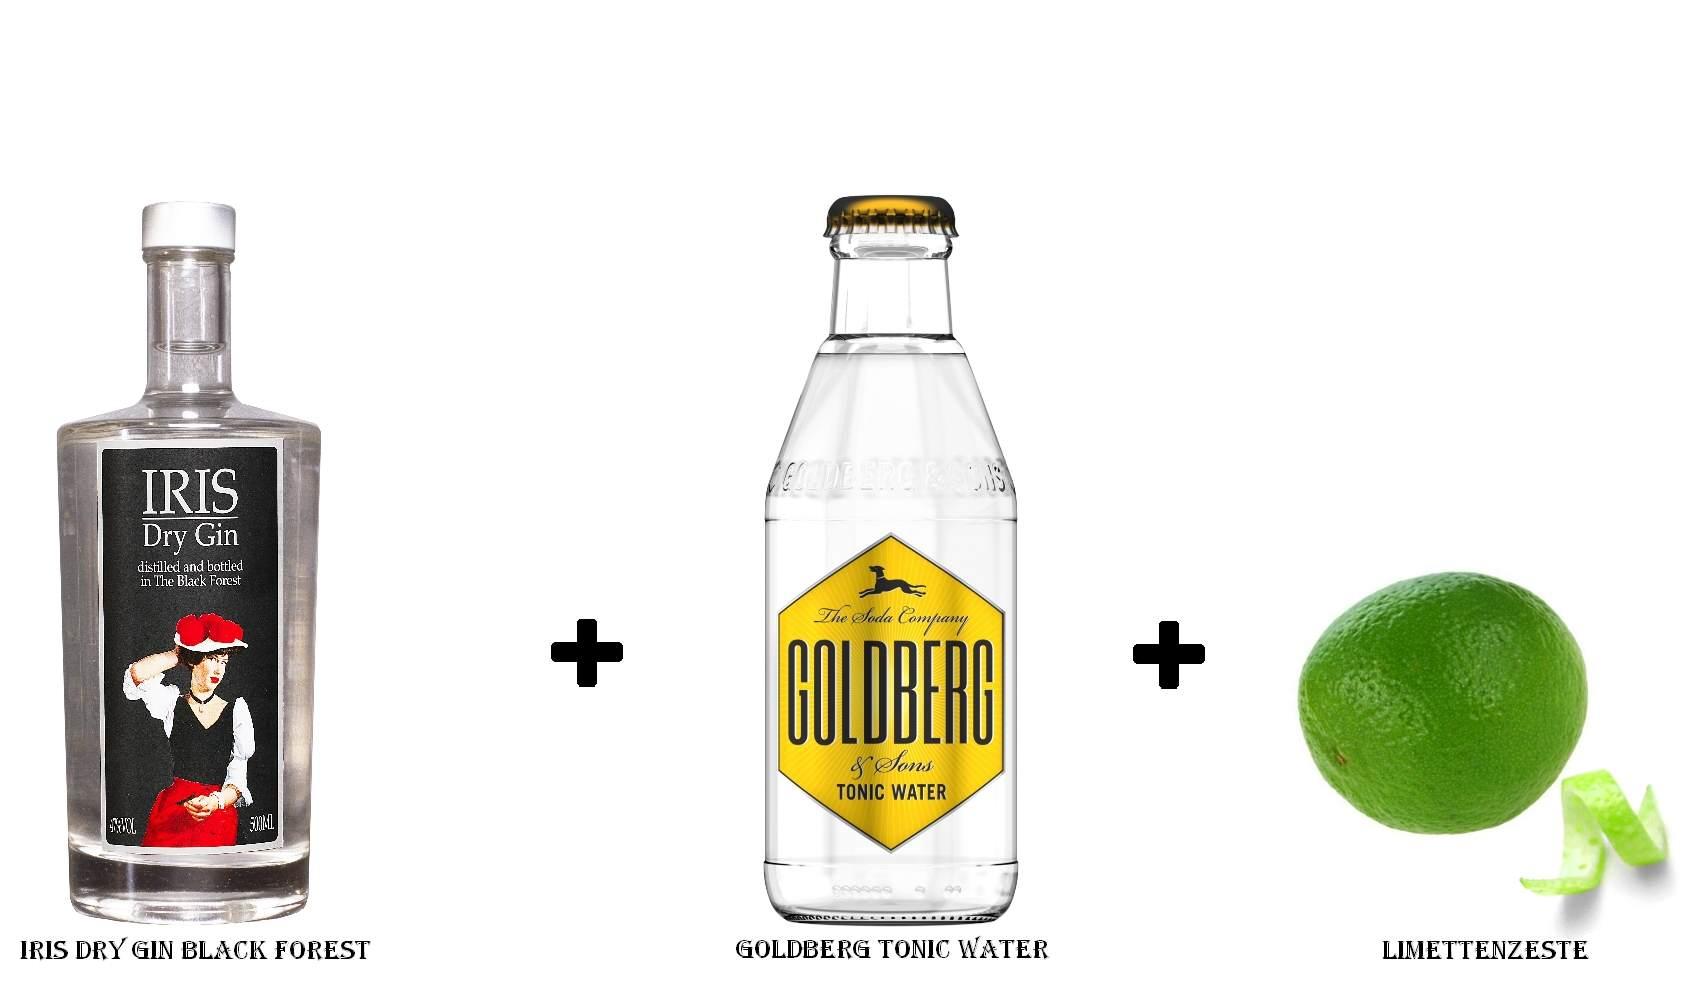 IRIS Dry Gin Black Forest + Goldberg Tonic Water + Limettenzeste